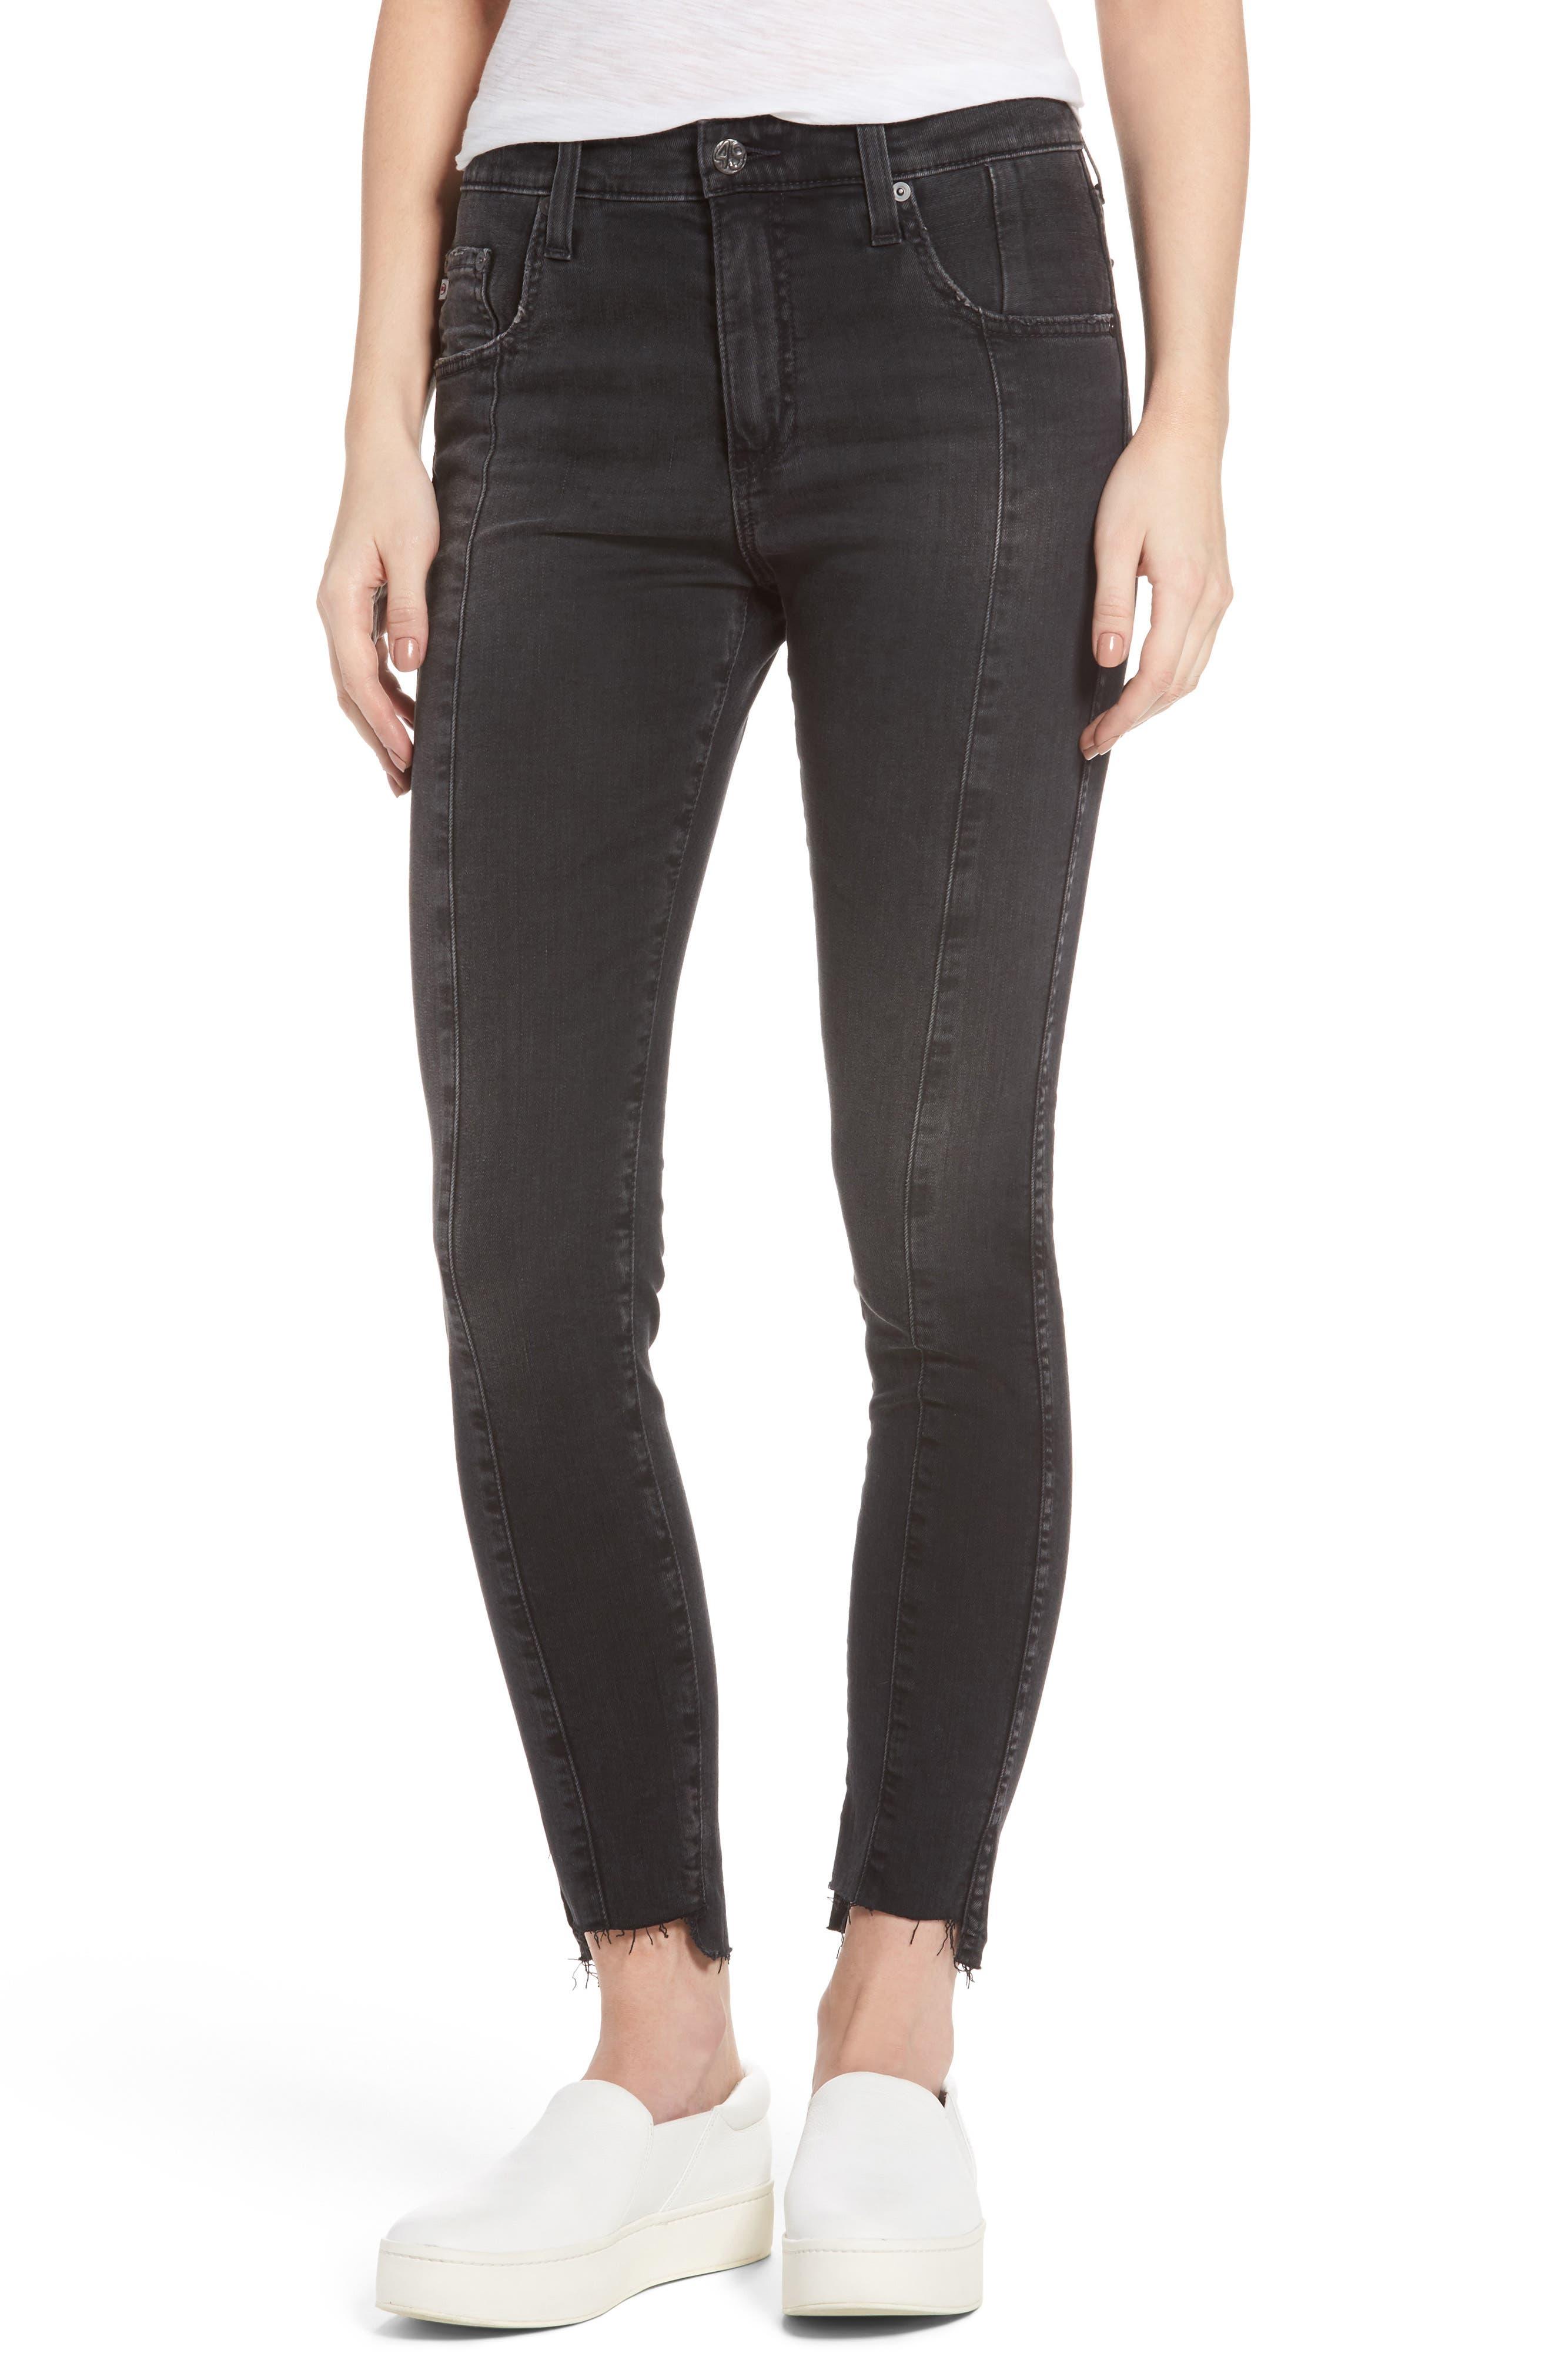 Alternate Image 1 Selected - AG The Farrah High Waist Ankle Skinny Jeans (Thirteen)